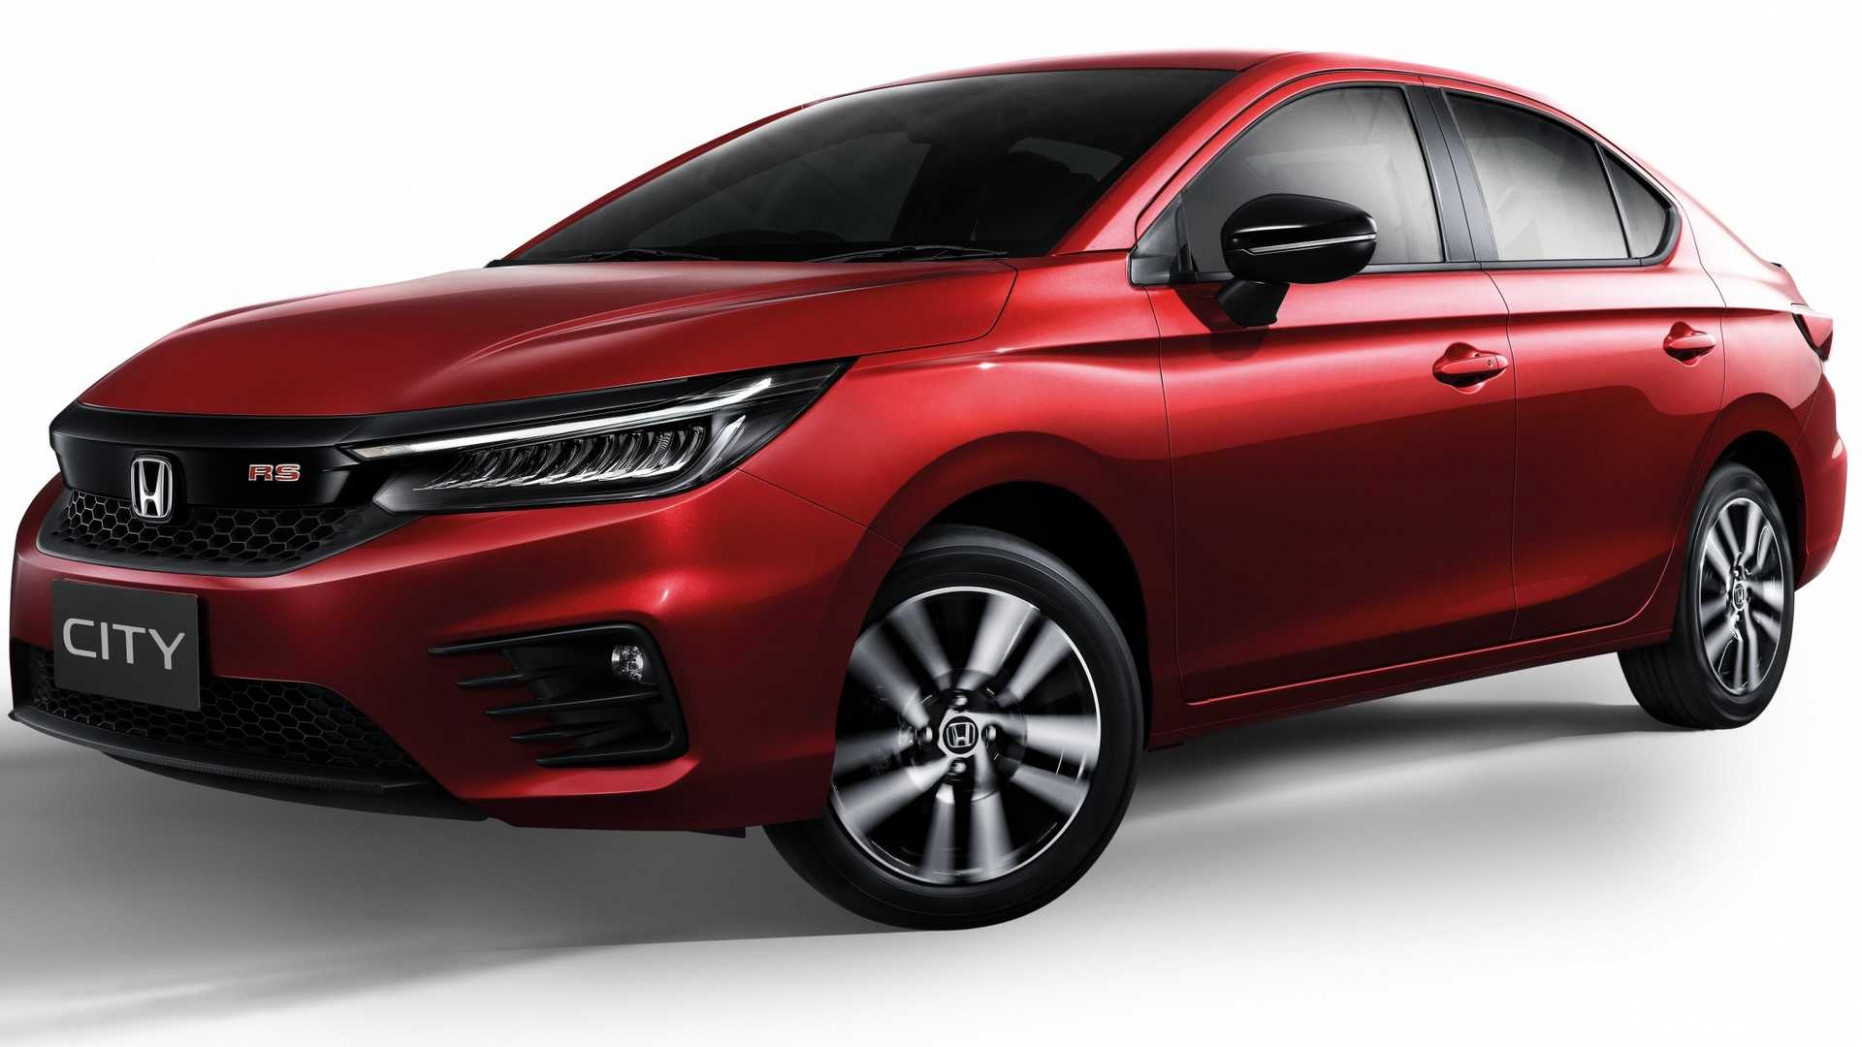 Release Date Honda City 2022 Launch Date In Pakistan